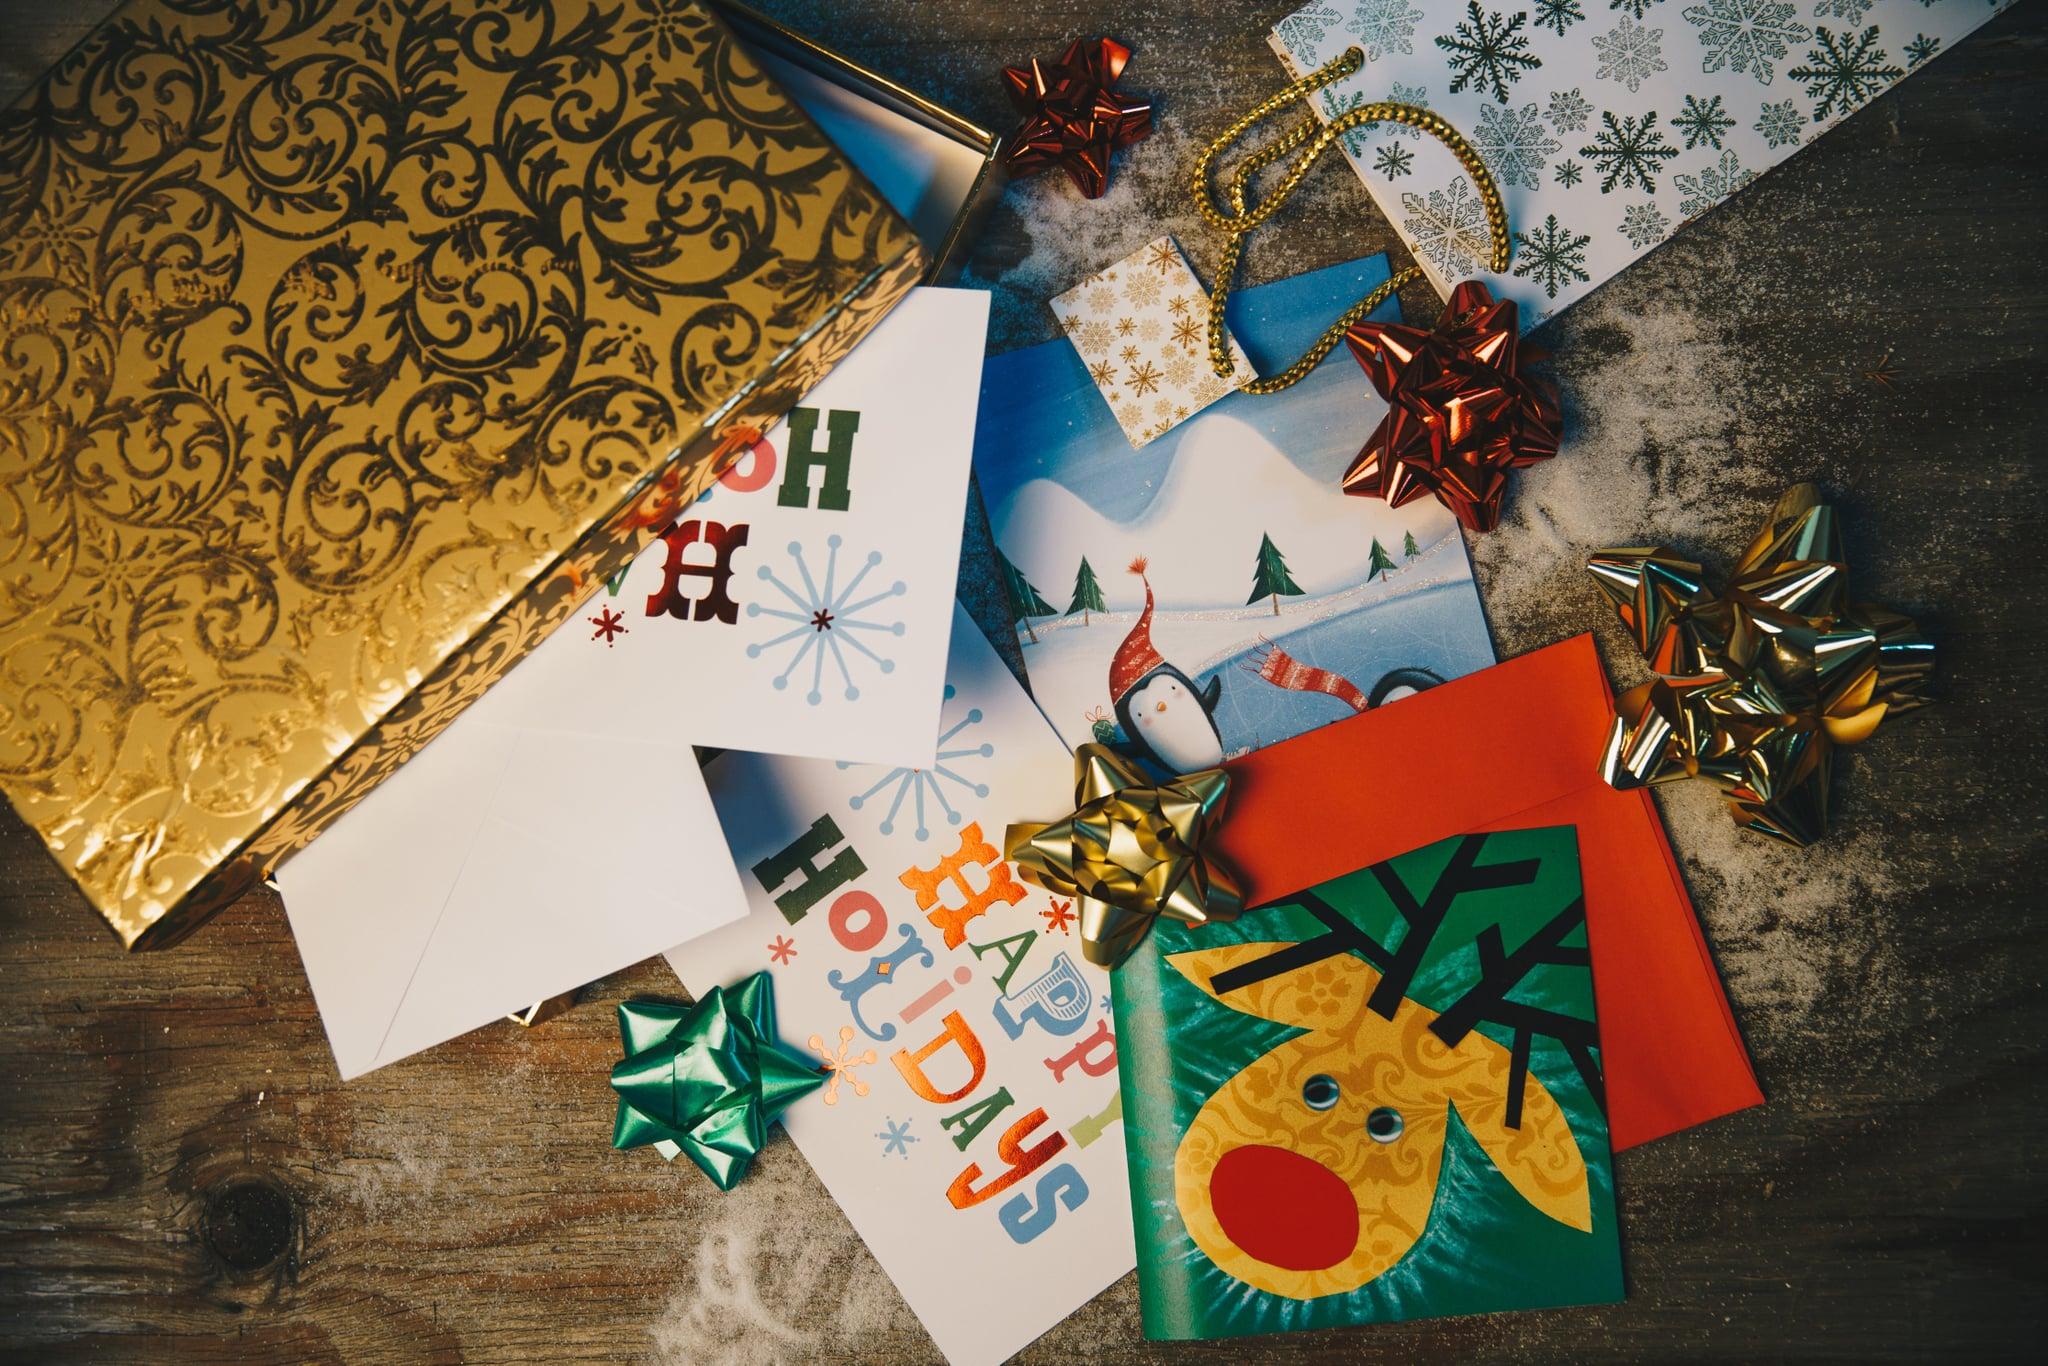 tmp_L4L82V_8b96891a1d06bd05_holiday-cards-gift-wrap.jpg